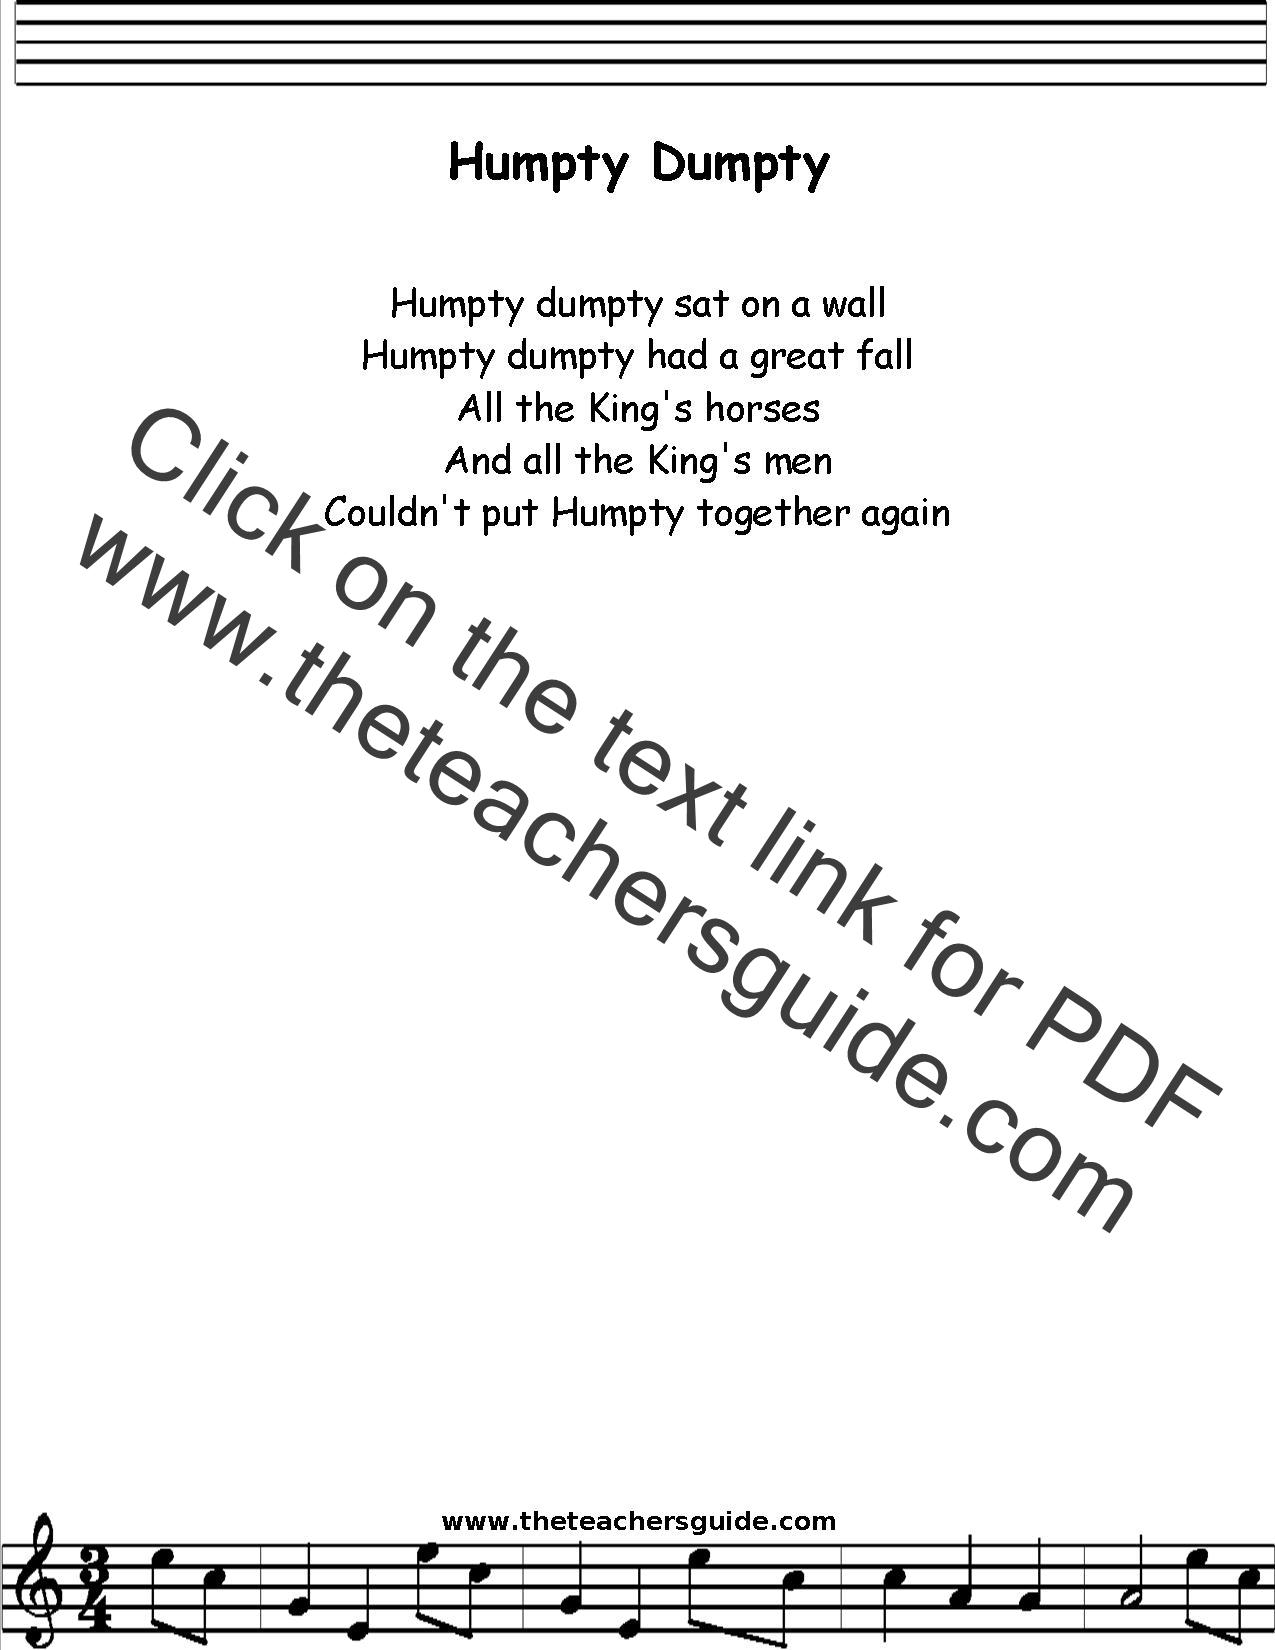 Humpty Dumpty Lyrics Printout Midi And Video